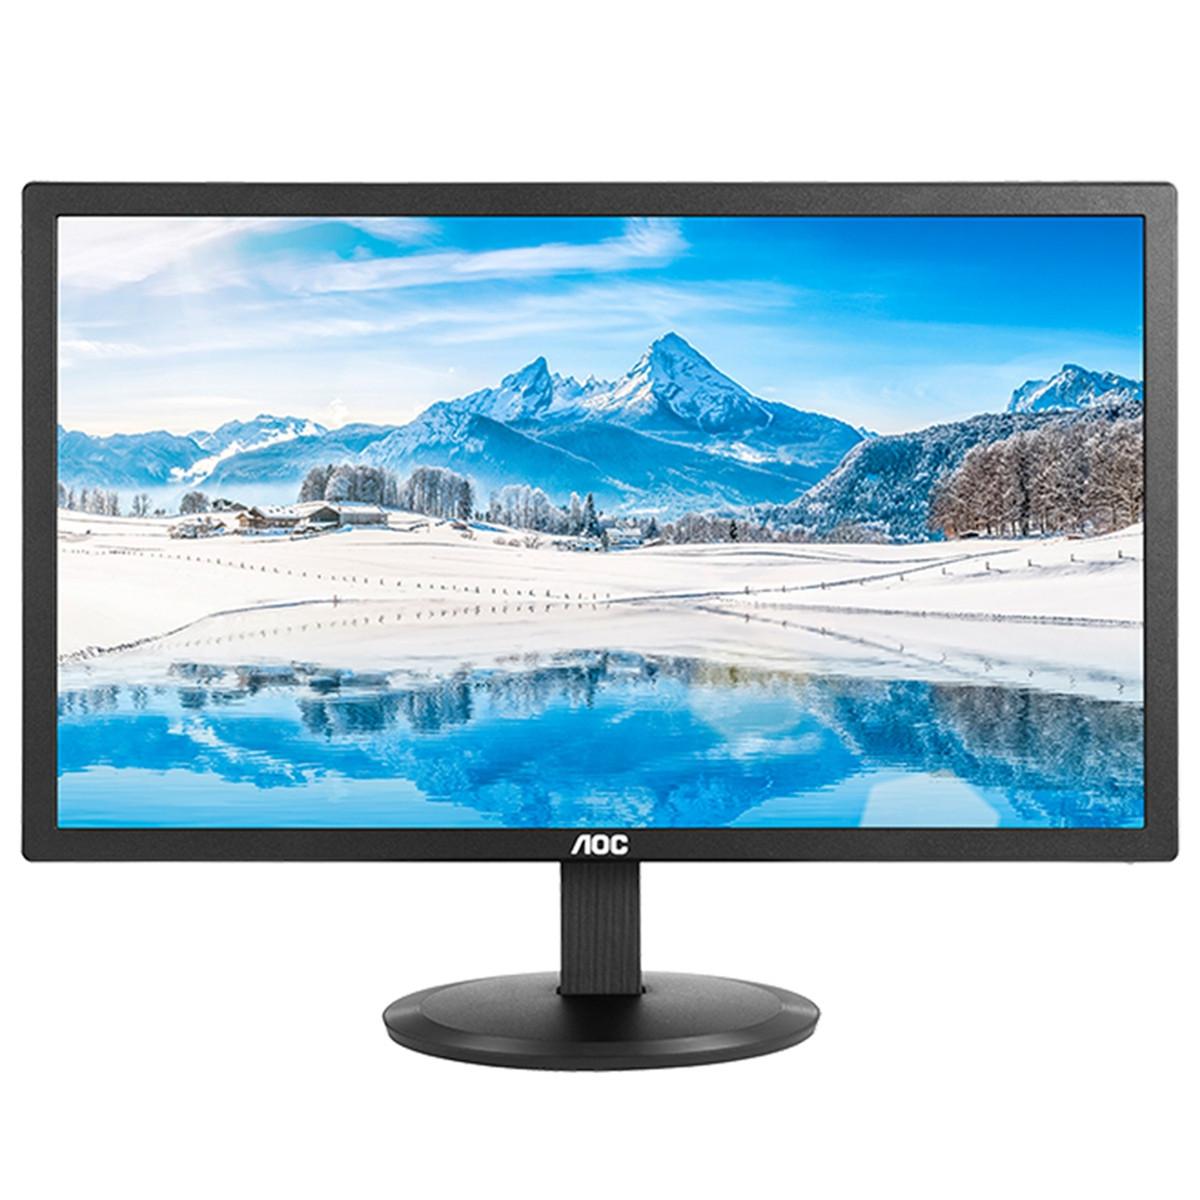 "Monitor 21,5"" LED Widescreen E2280SWDN 1920x1080   AOC"